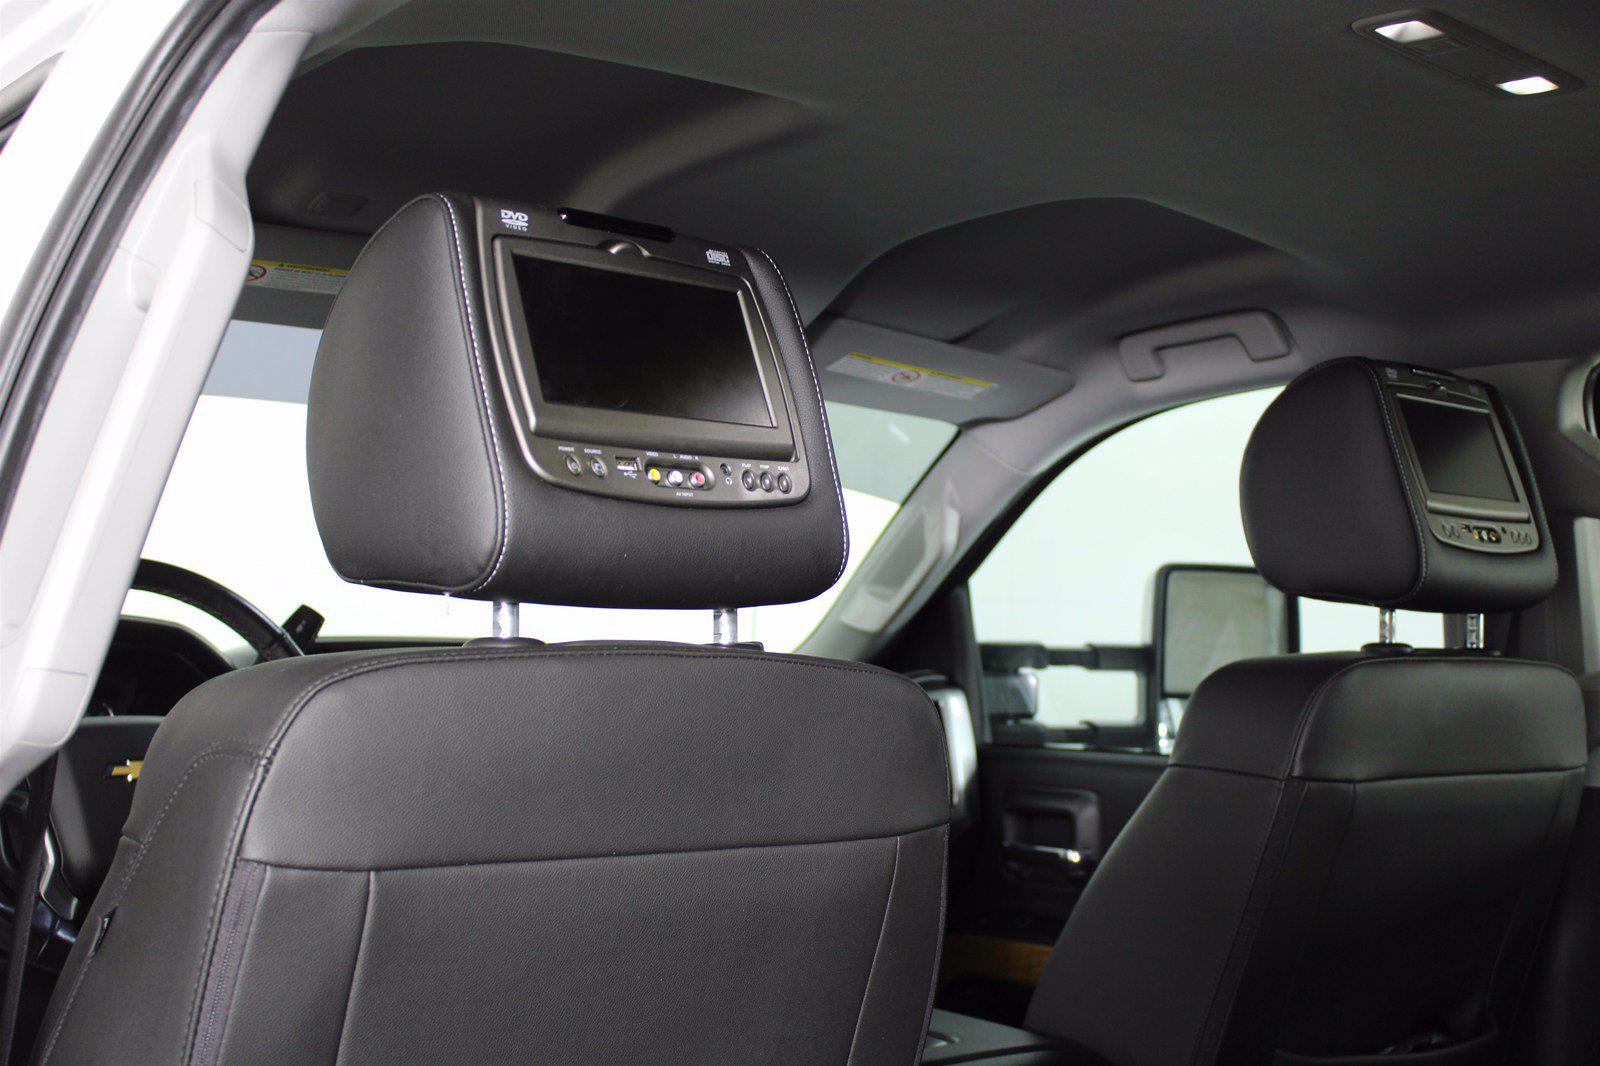 2016 Chevrolet Silverado 2500 Crew Cab 4x2, Pickup #D110630A - photo 9